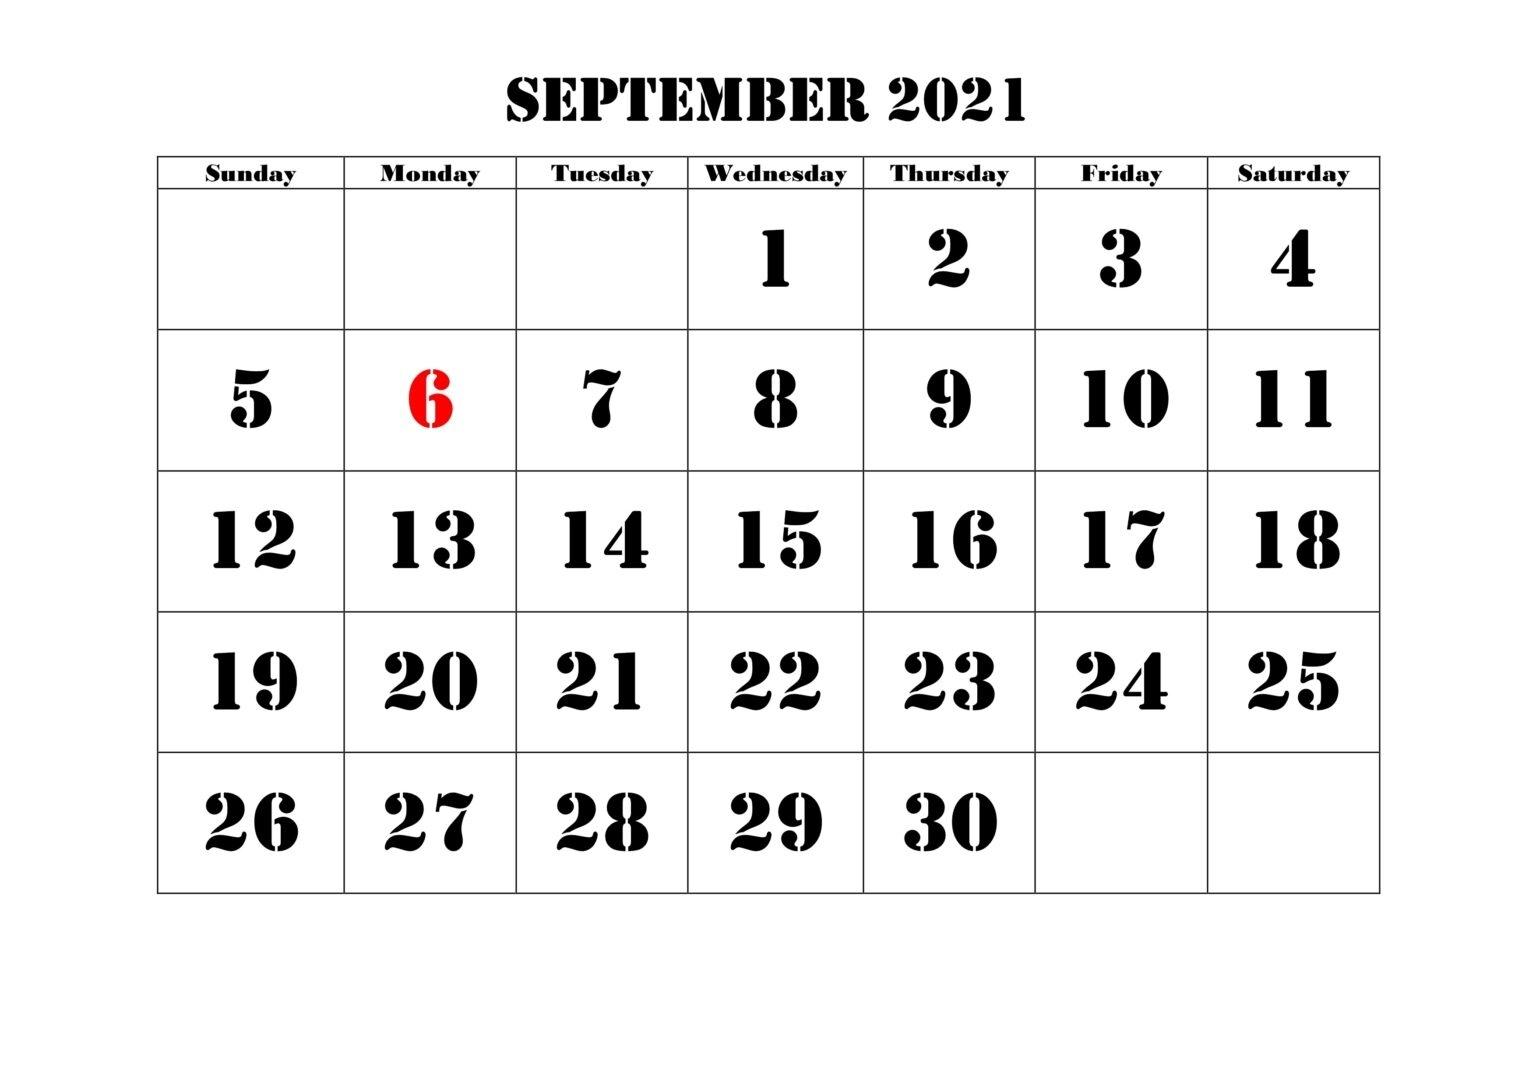 Free September 2021 Calendar Printable - Blank Templates September - December 2021 Calendar